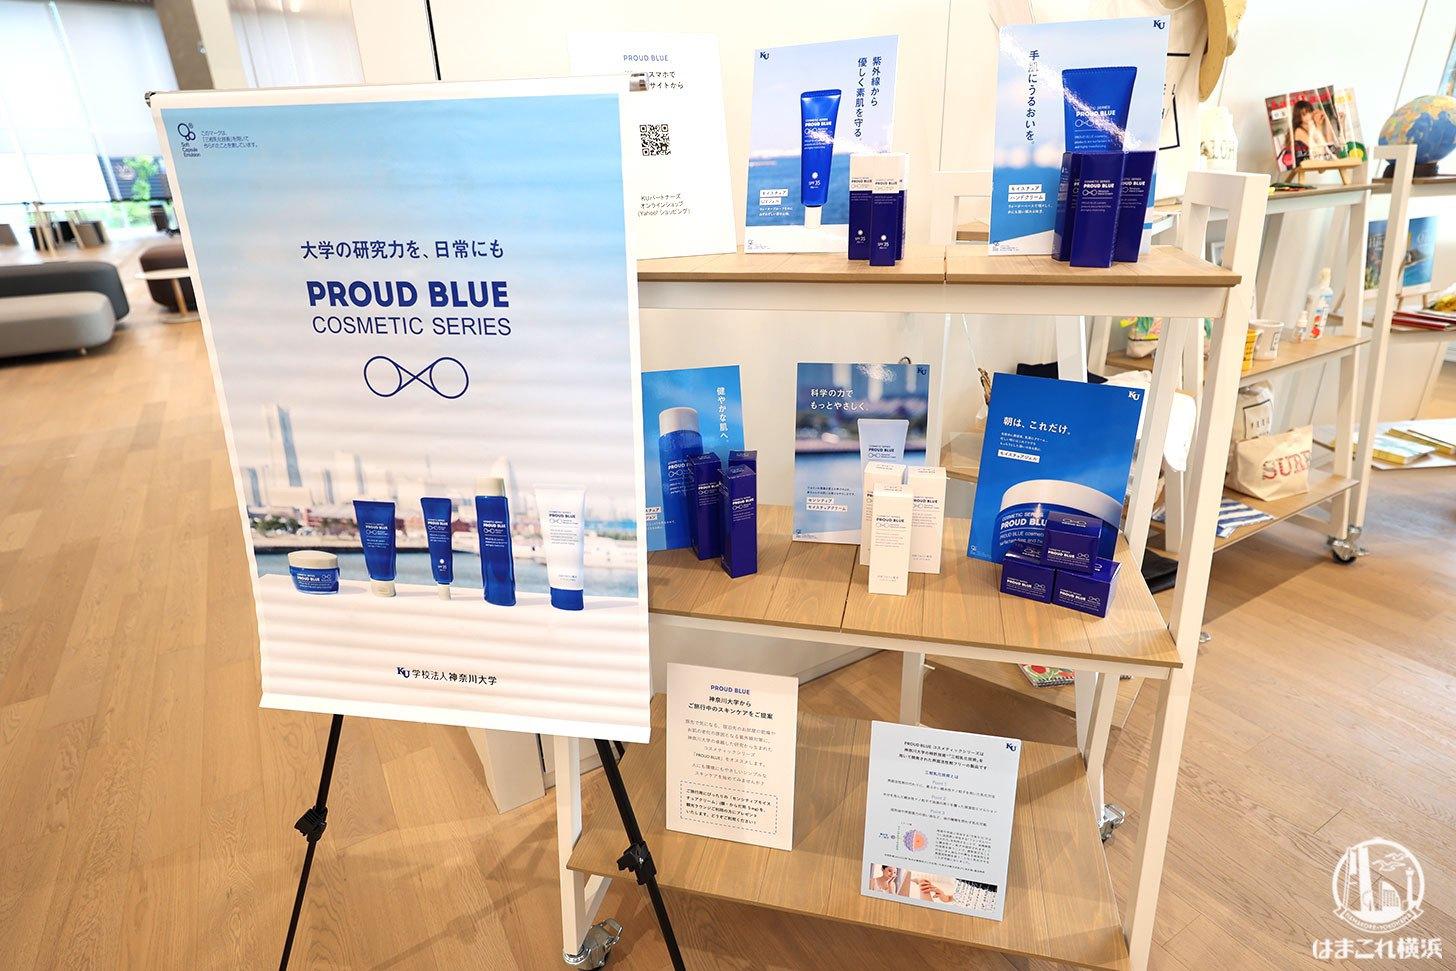 PROUD BLUE(プラウドブルー)